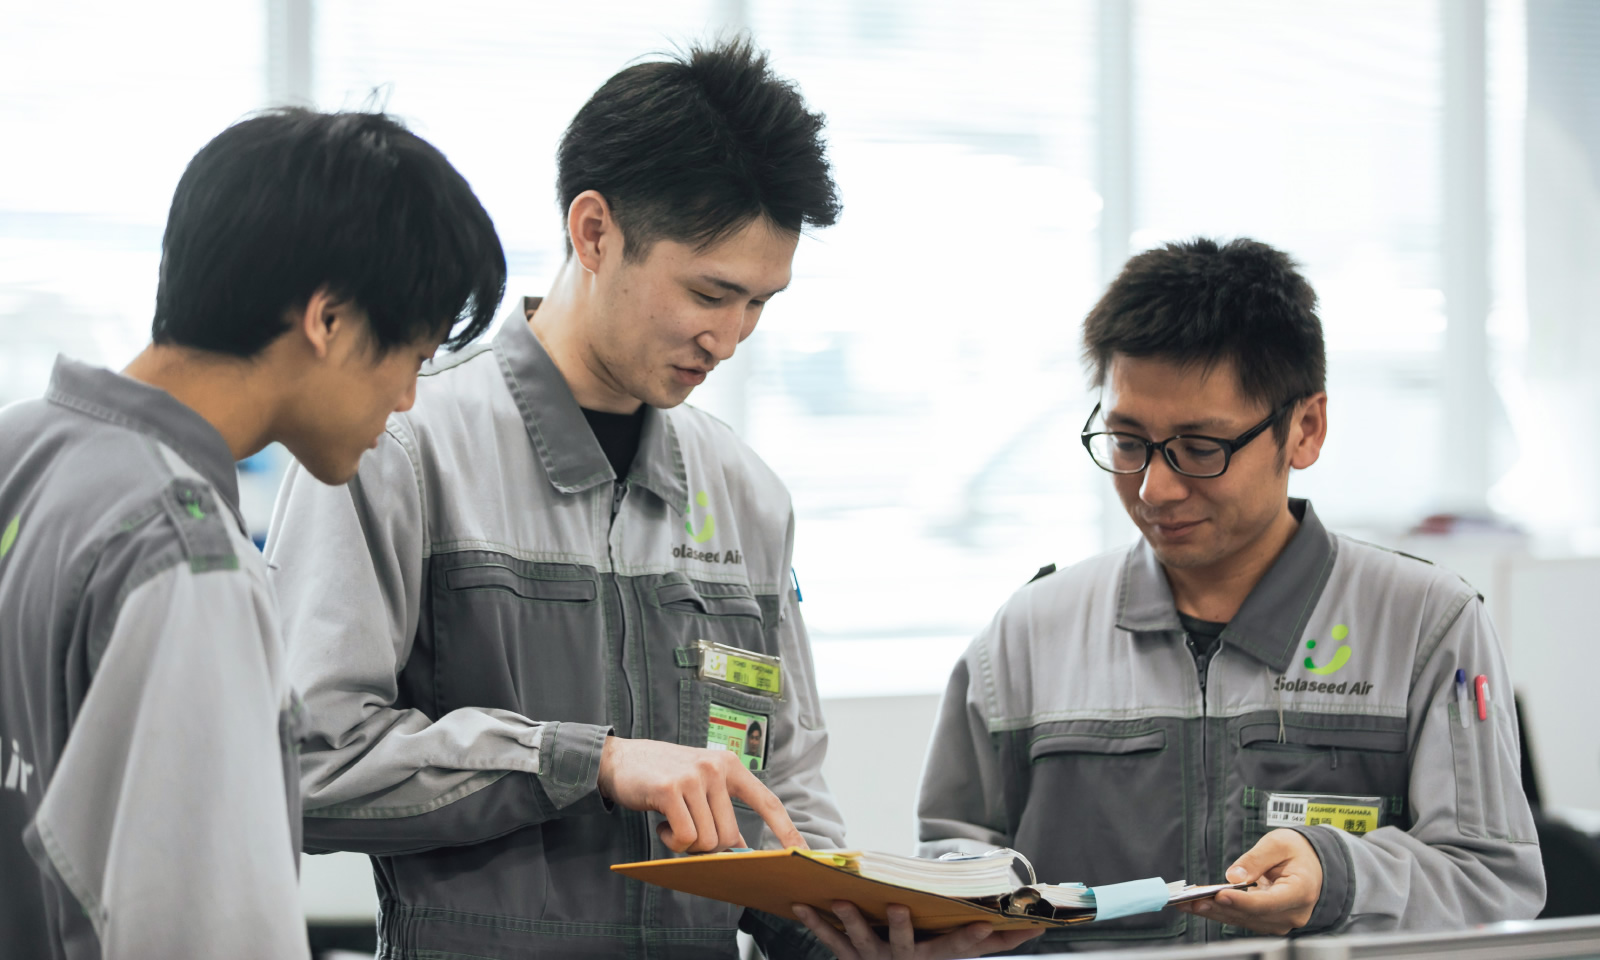 WORK SIDE 06|新卒採用|採用情報|ソラシドエア